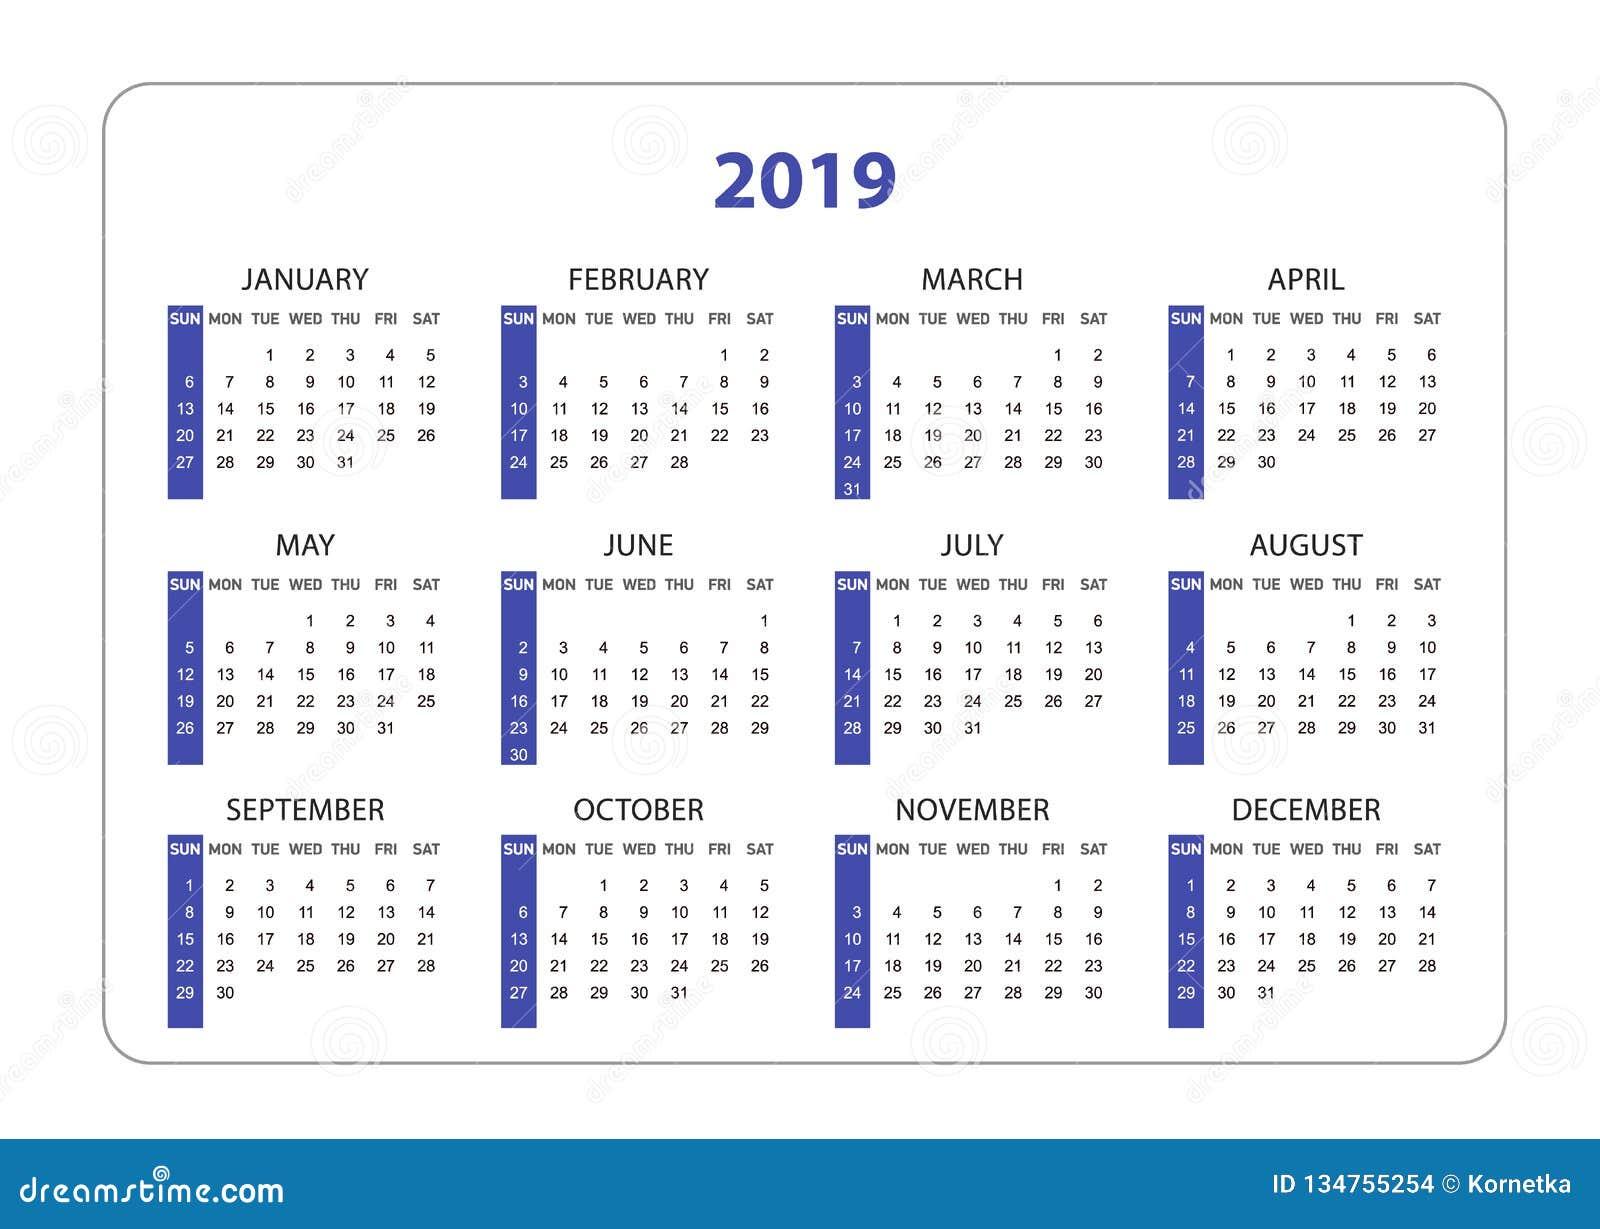 Calendrier De Poche 2019.Annee Horizontale De Calendrier De Poche Le 2019 Calibre